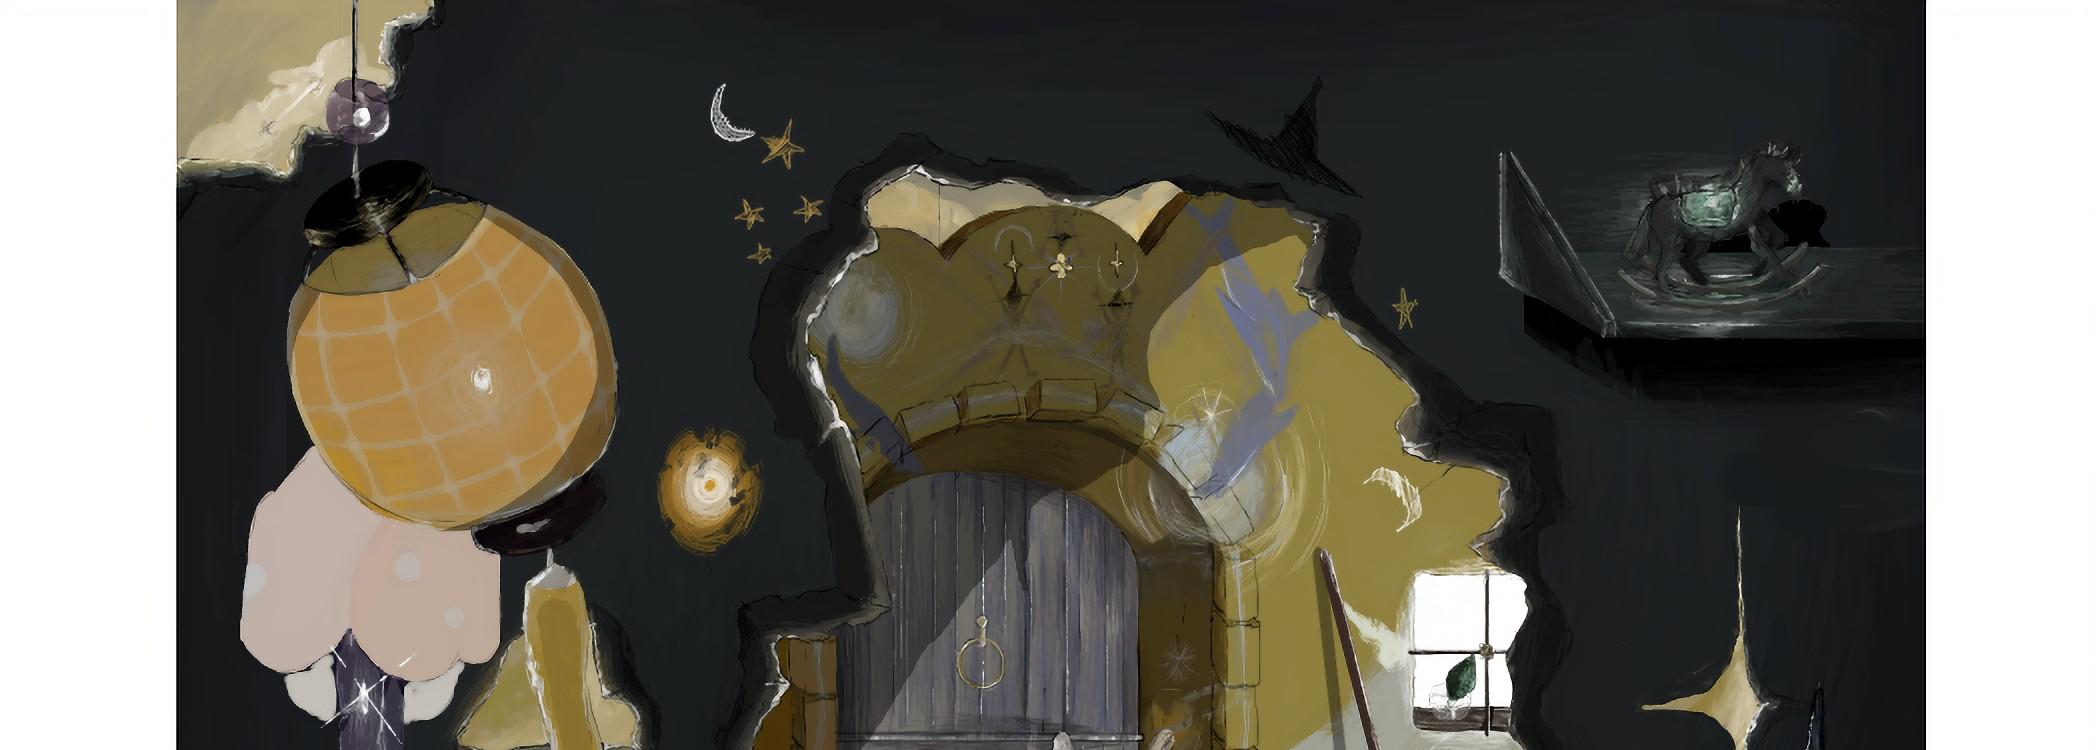 Stalker Witch Illust of cnoruu883